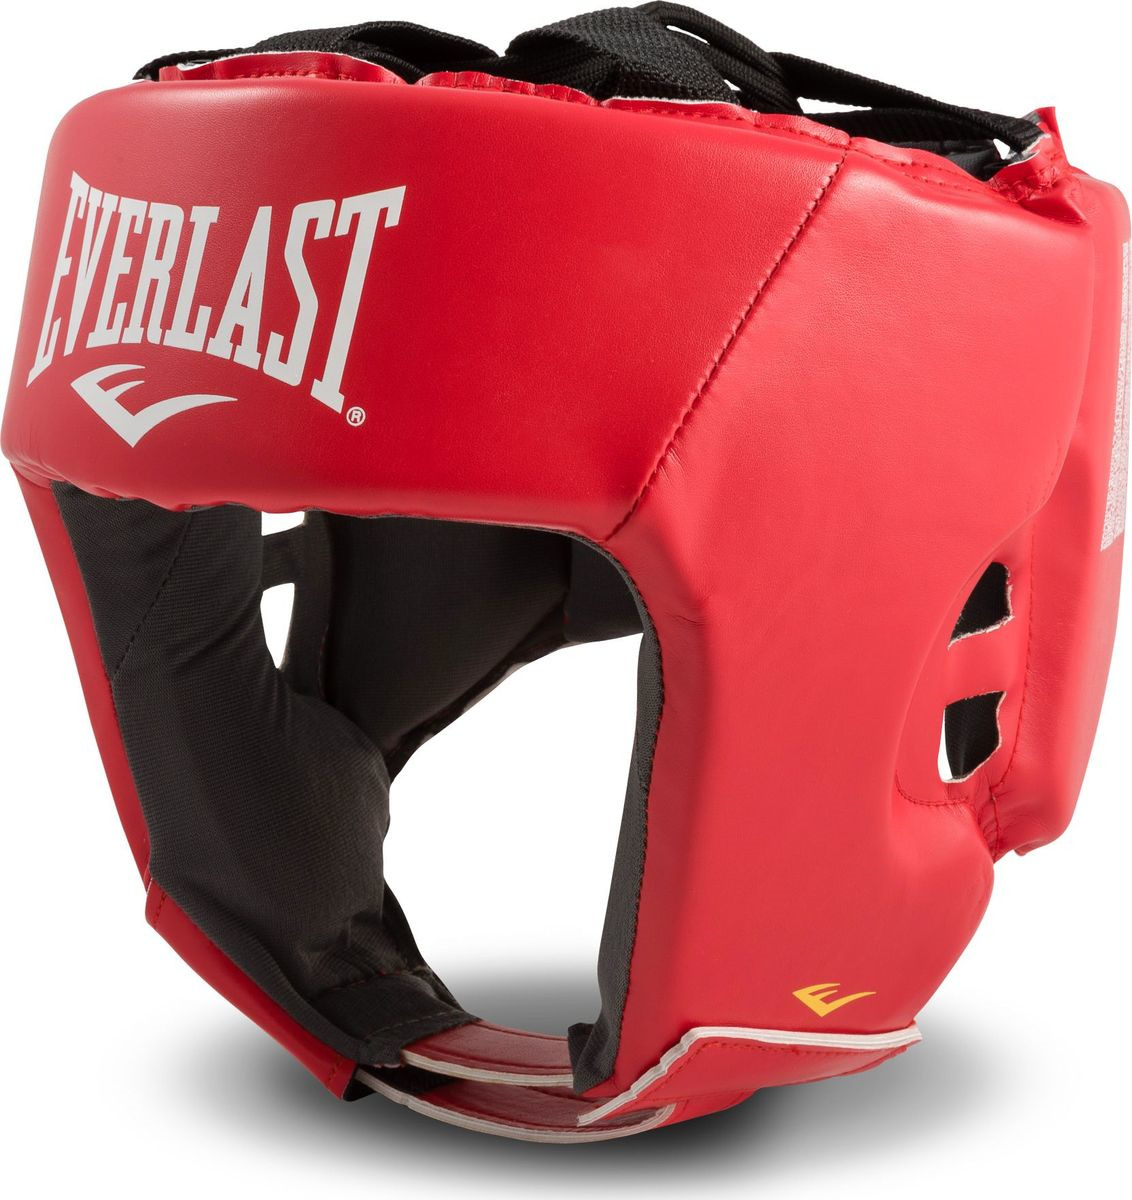 Шлем боксерский Everlast Amateur Competition, 610400-10 PU, красный, размер L Everlast